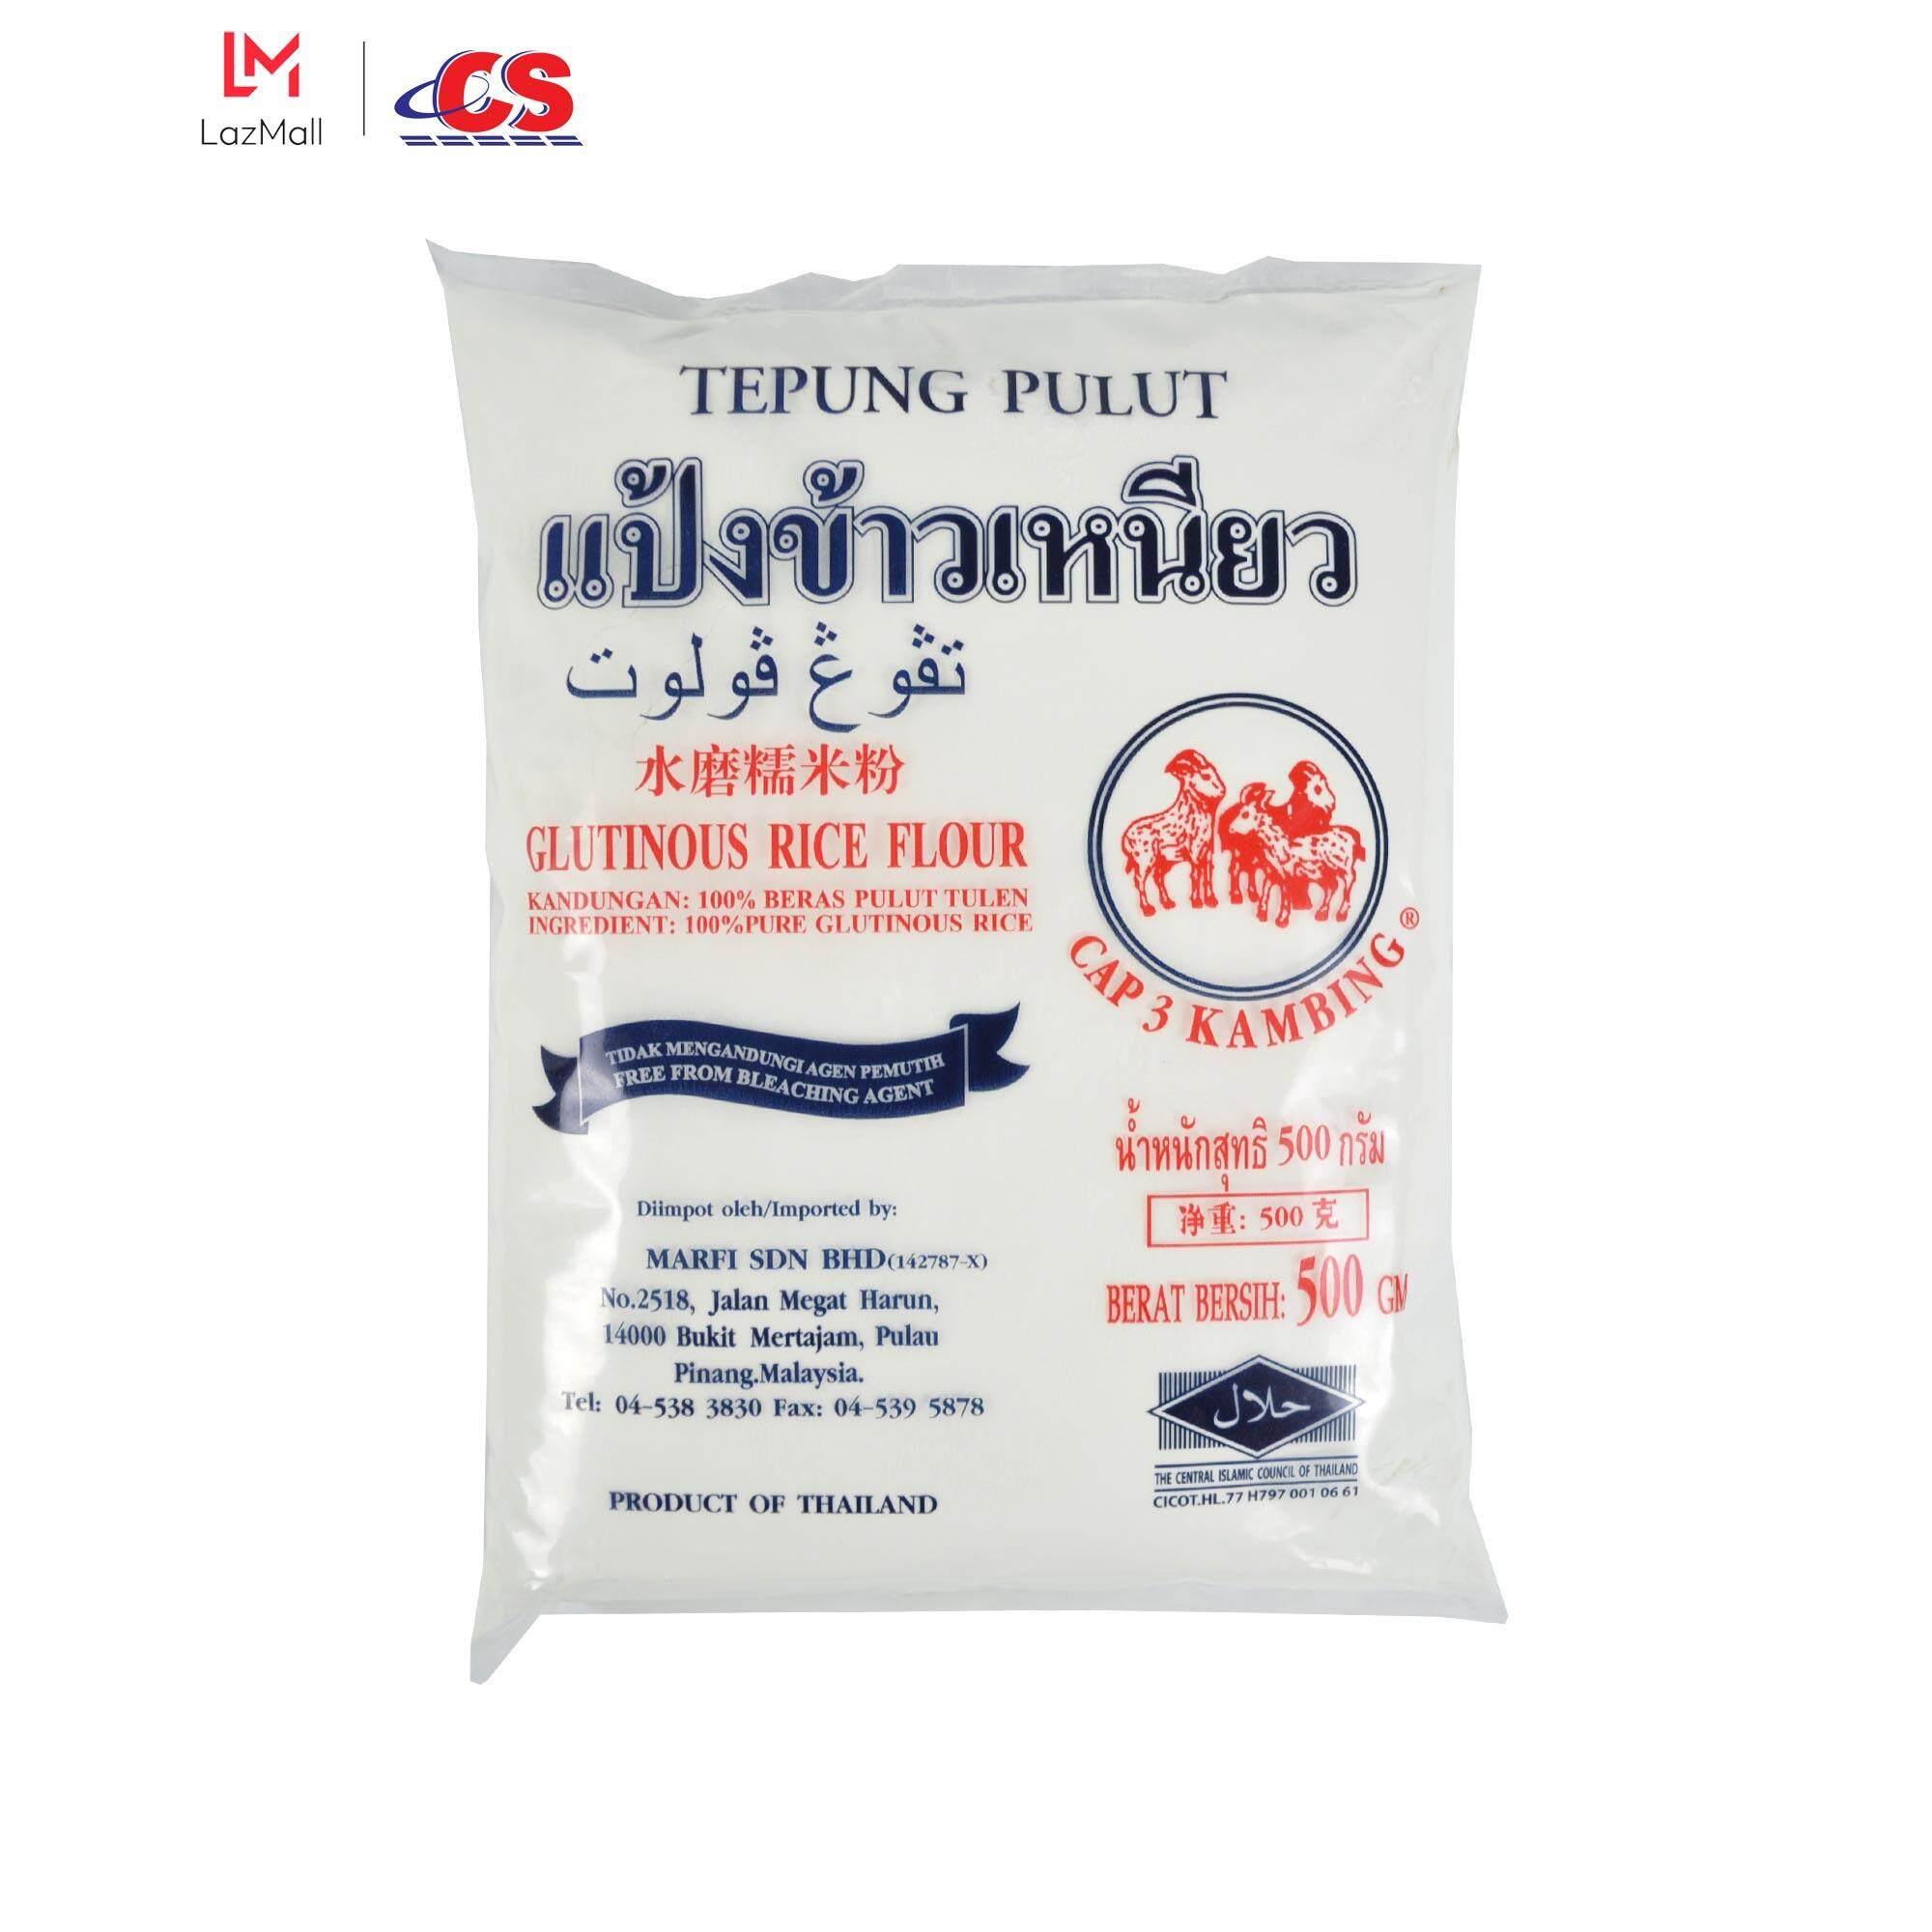 CAP 3 KAMBING Glutinous Rice Flour